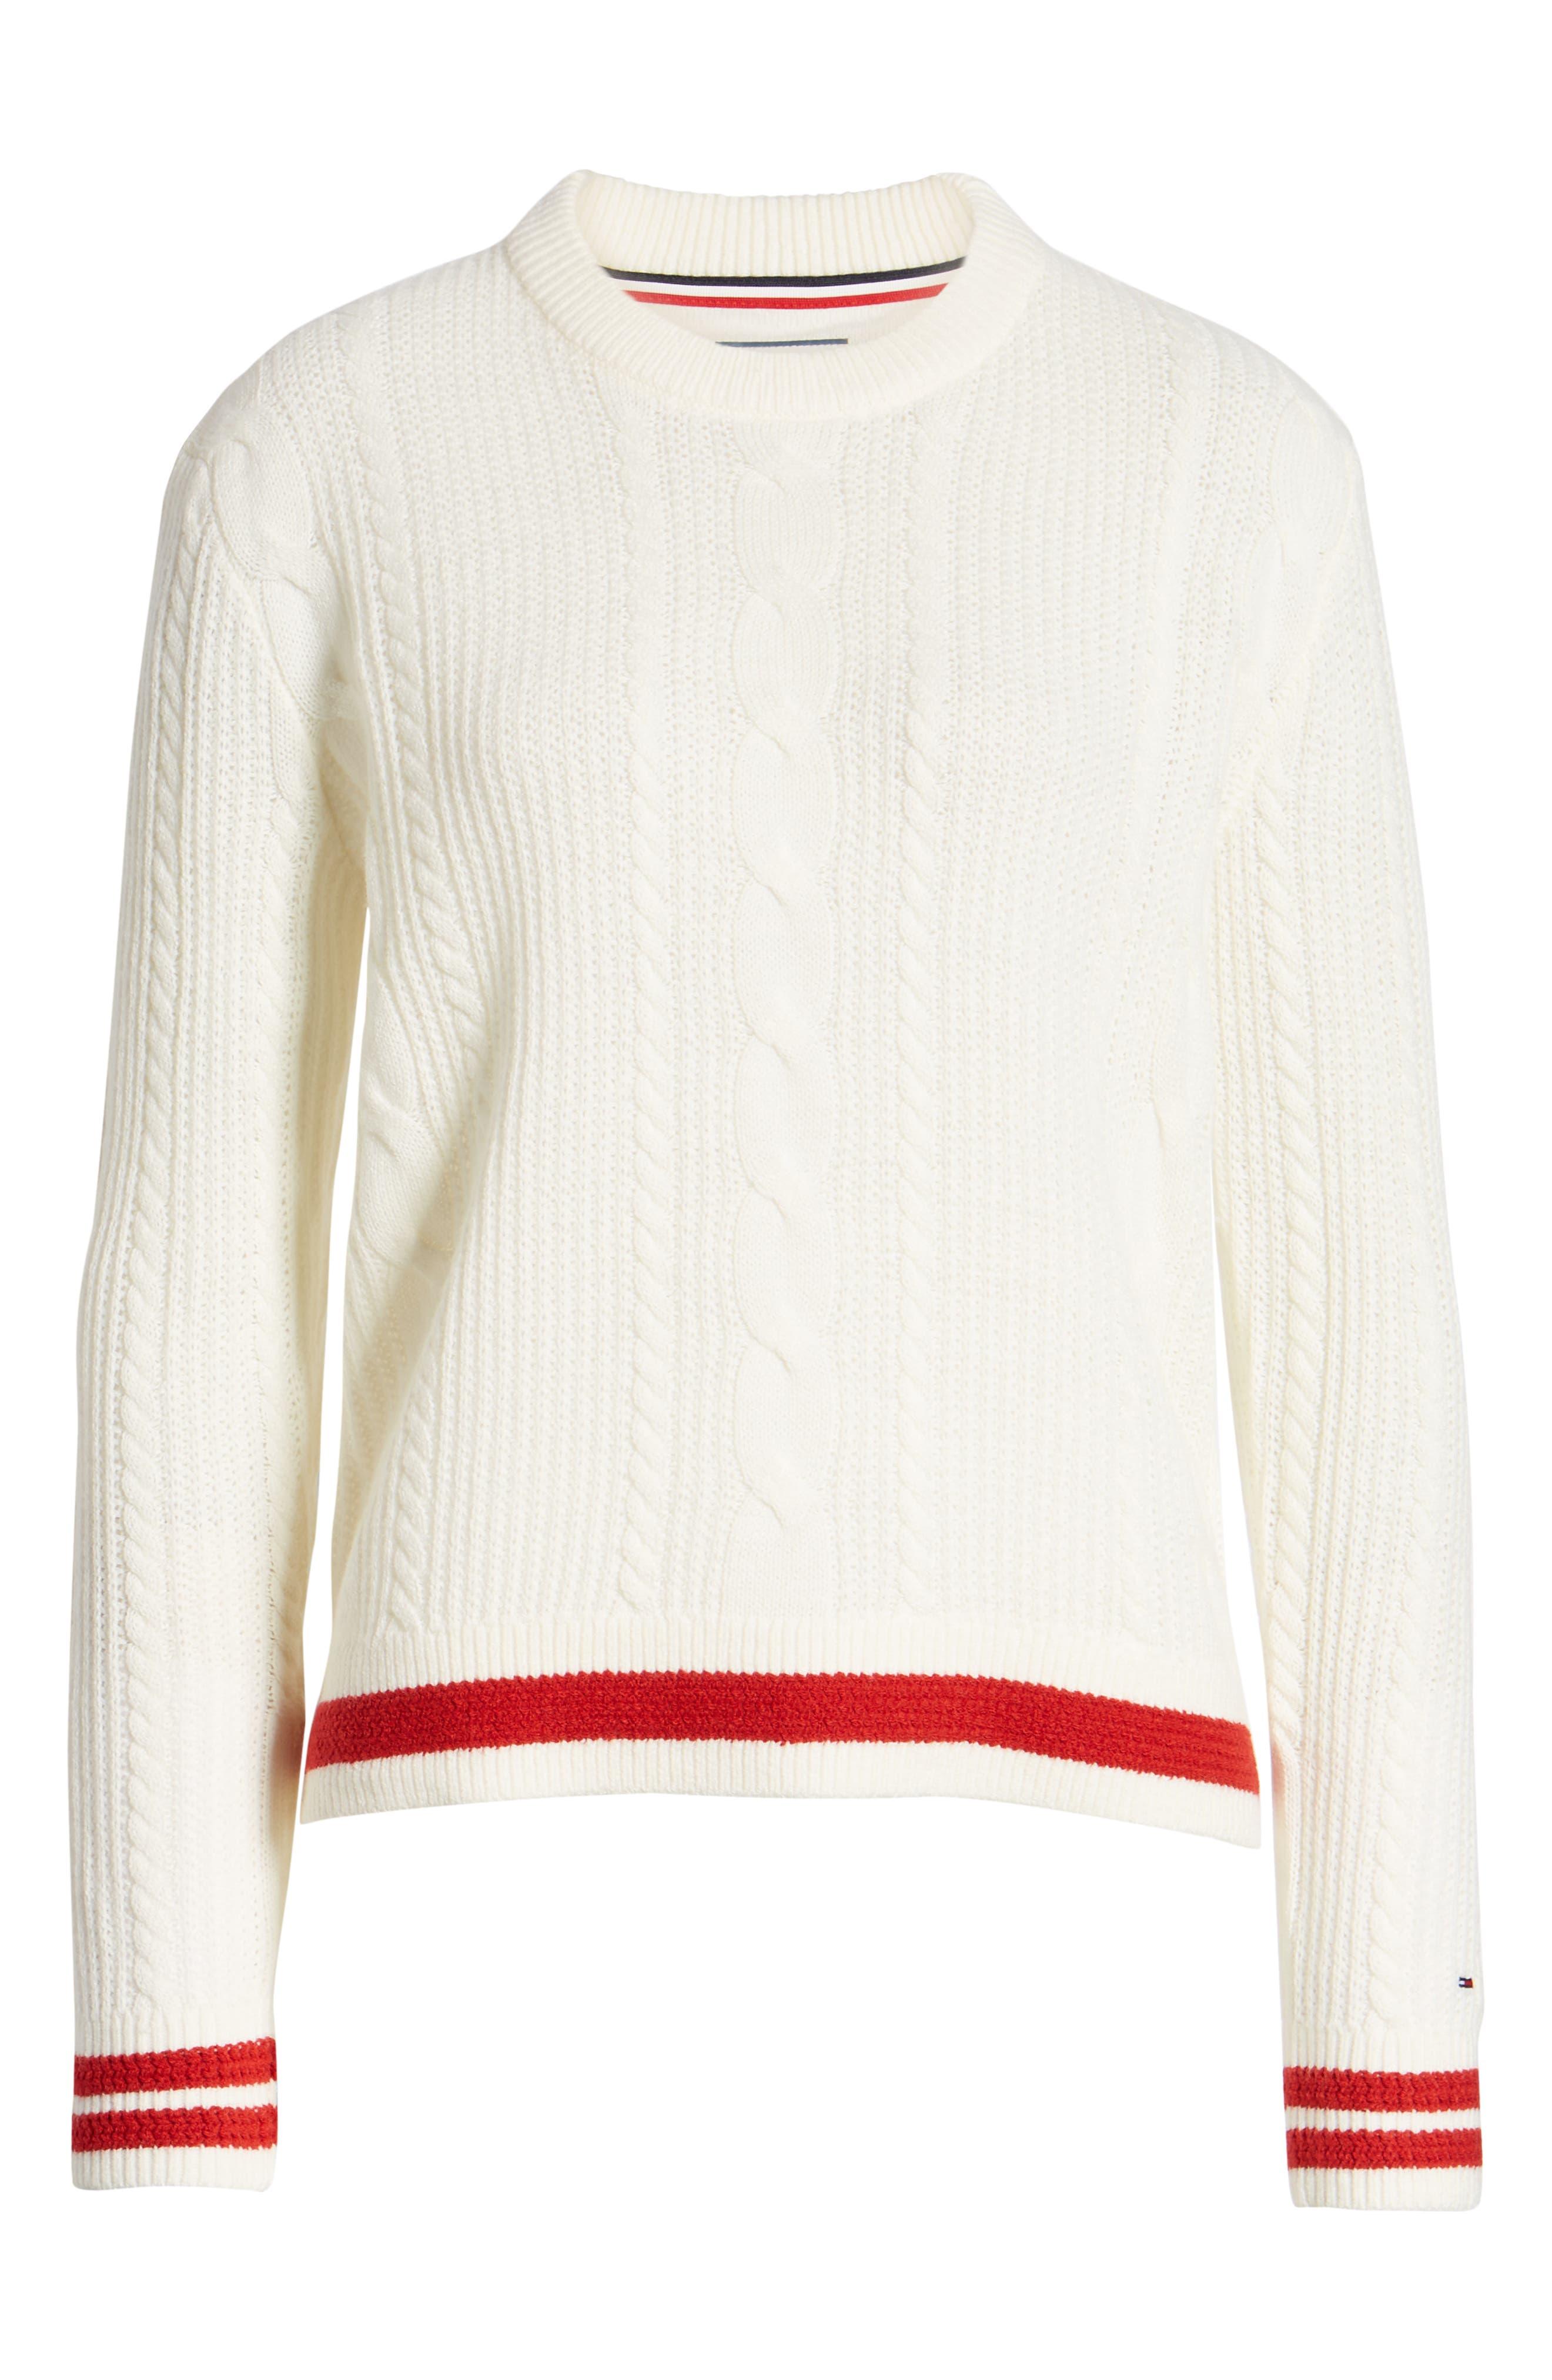 TJW Cable Knit Sweater,                             Alternate thumbnail 6, color,                             CLOUD DANCER